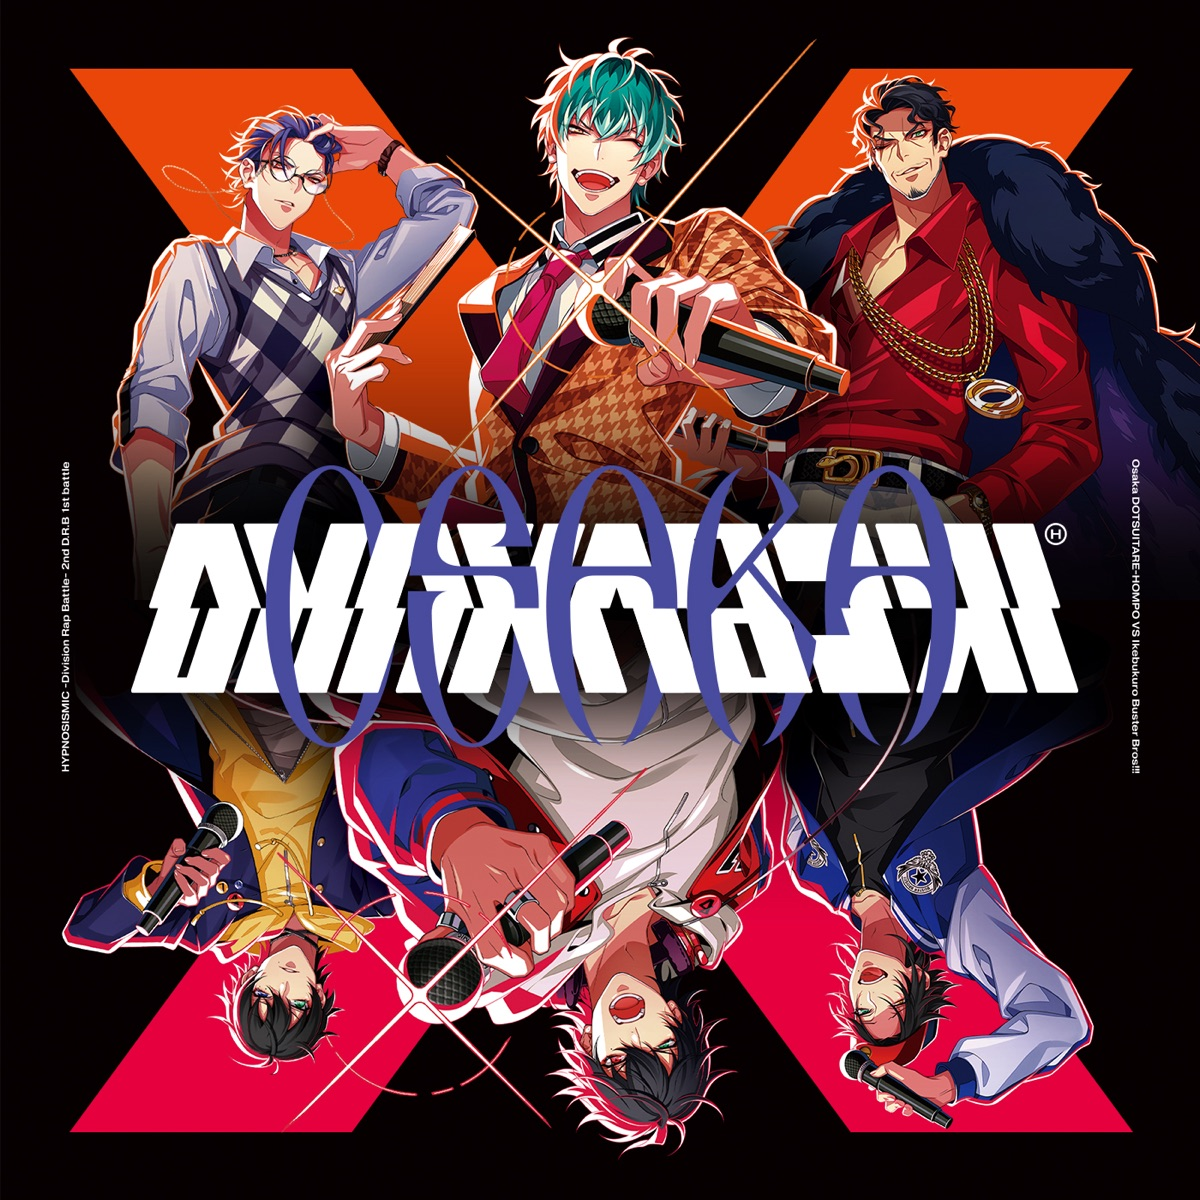 『Buster Bros!!! - Re:start!!! 歌詞』収録の『ヒプノシスマイク-Division Rap Battle- 2nd D.R.B どついたれ本舗 VS Buster Bros!!!』ジャケット